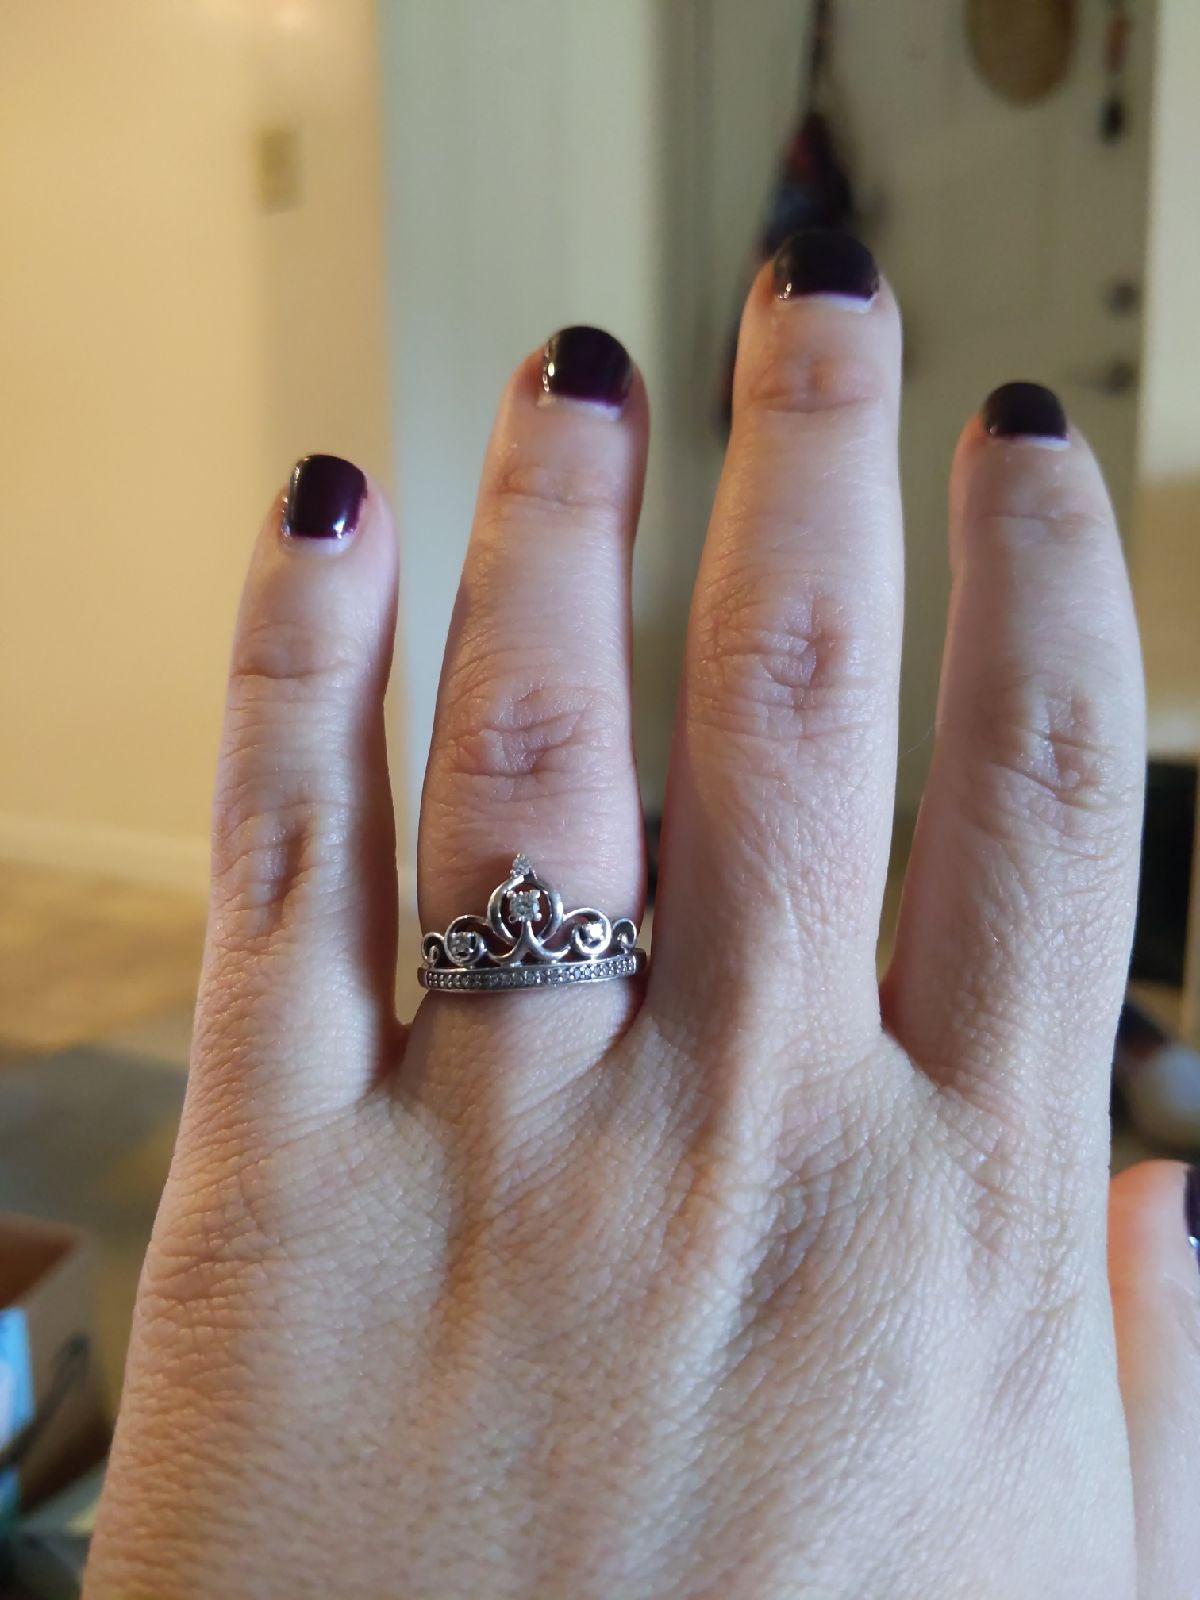 Cinderella SS 1/7CTTW Diamond Ring Size